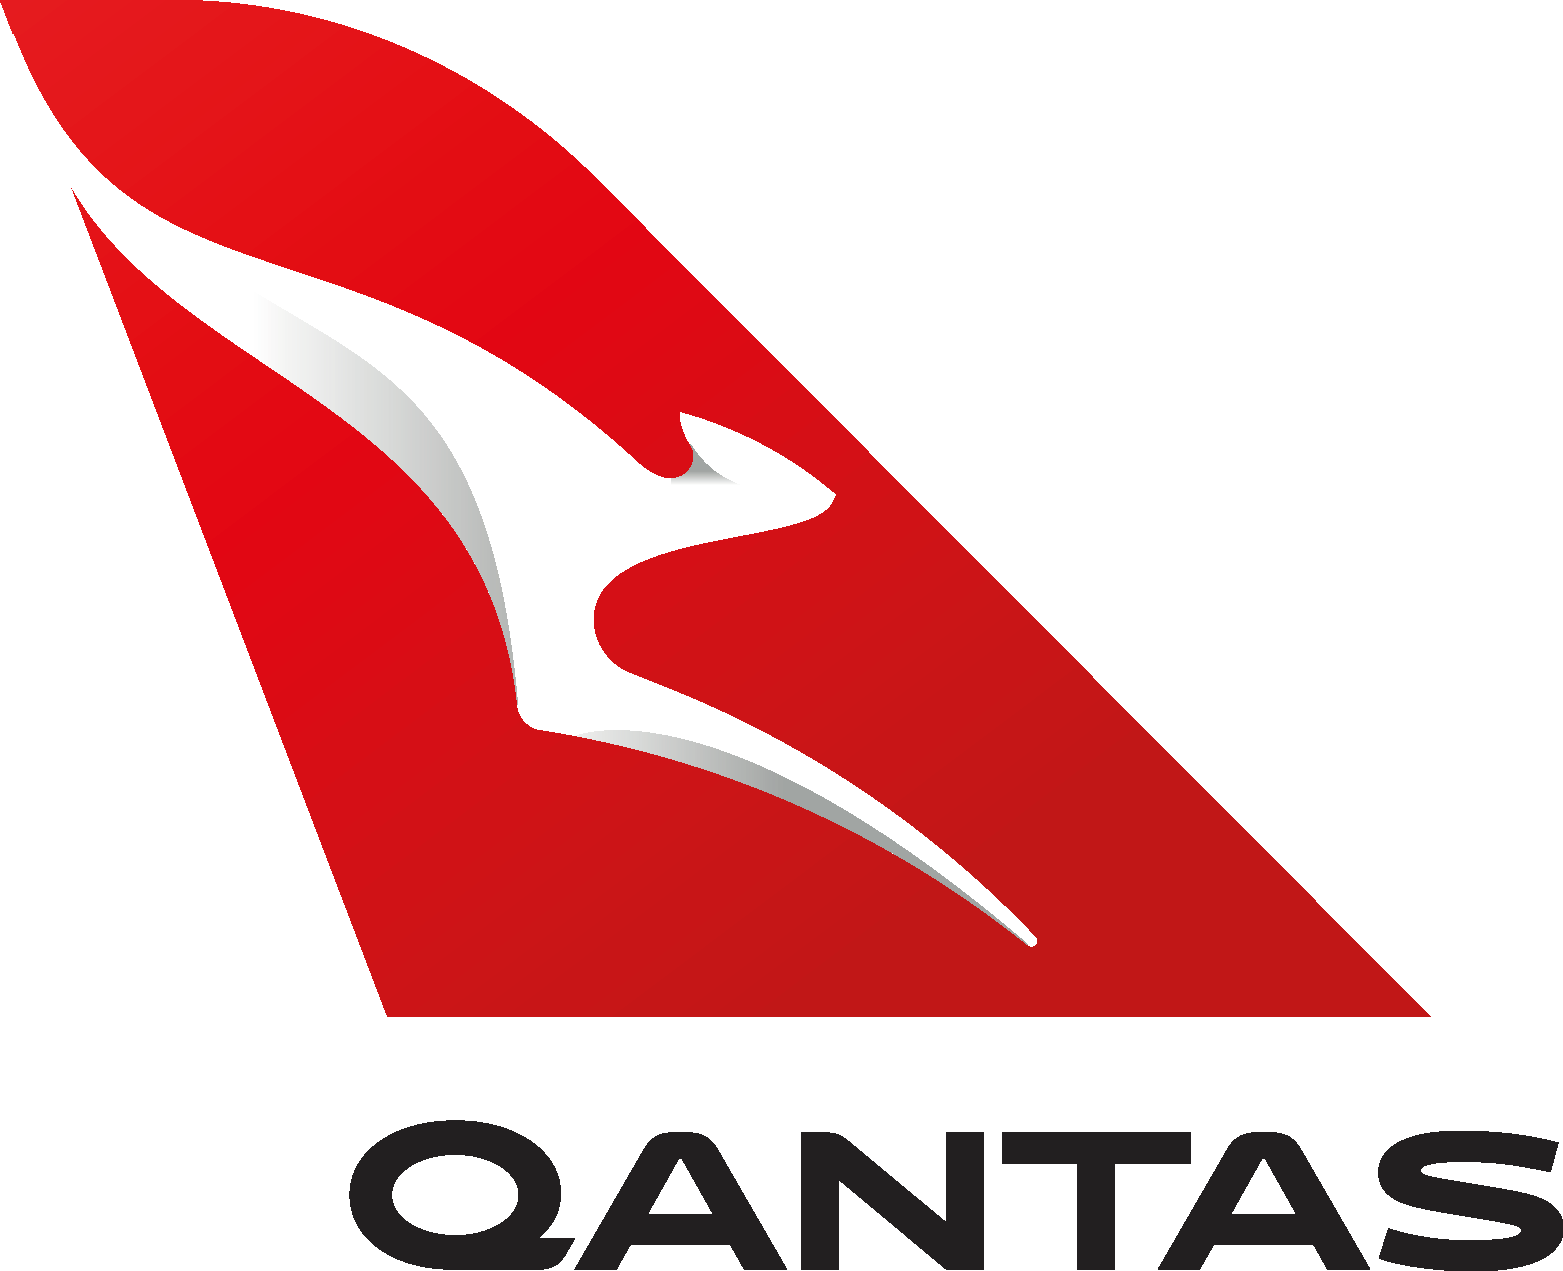 Qantas Spirit of Australia png